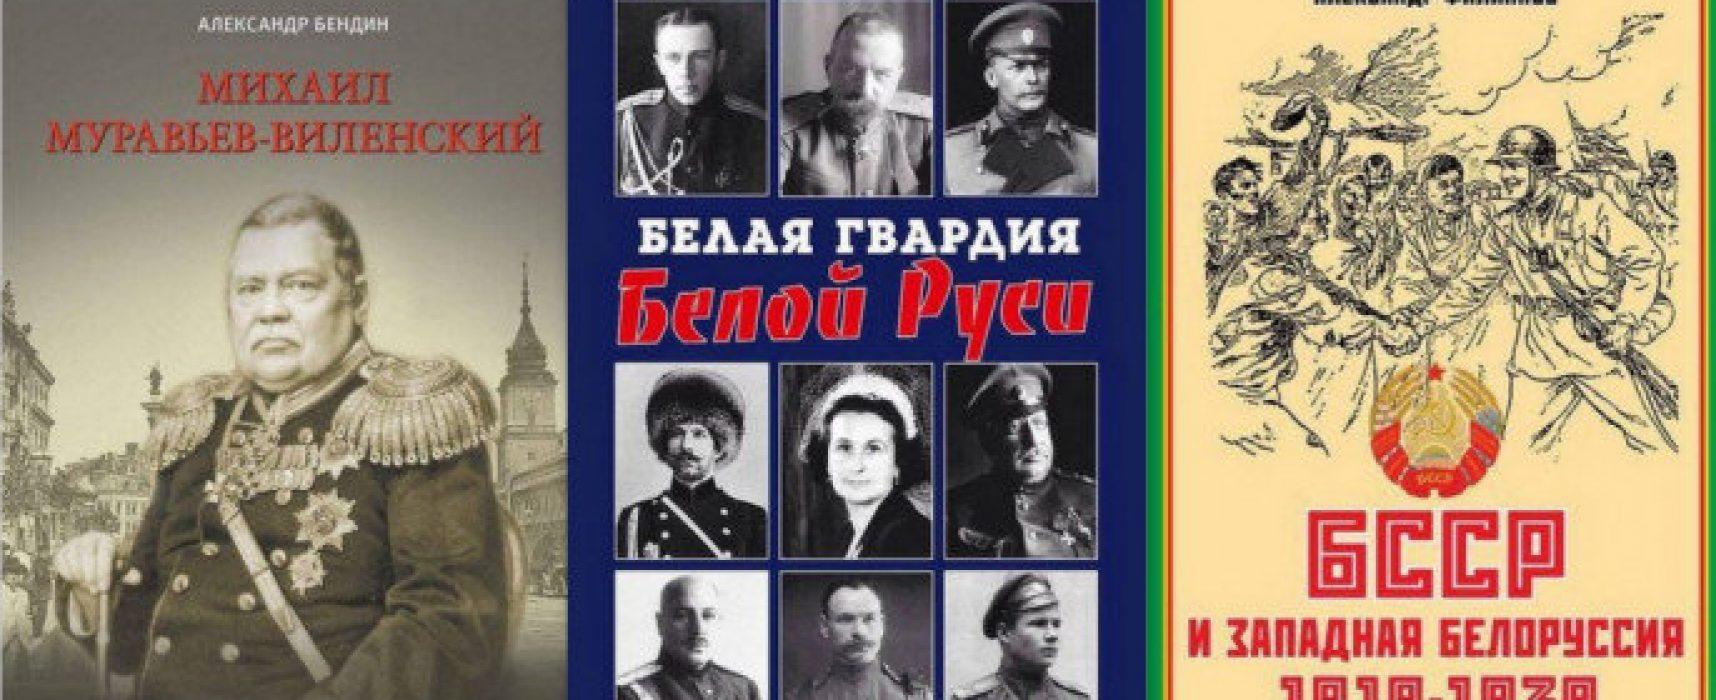 Can Forrest Gump Defeat Russian Propaganda in Belarus?